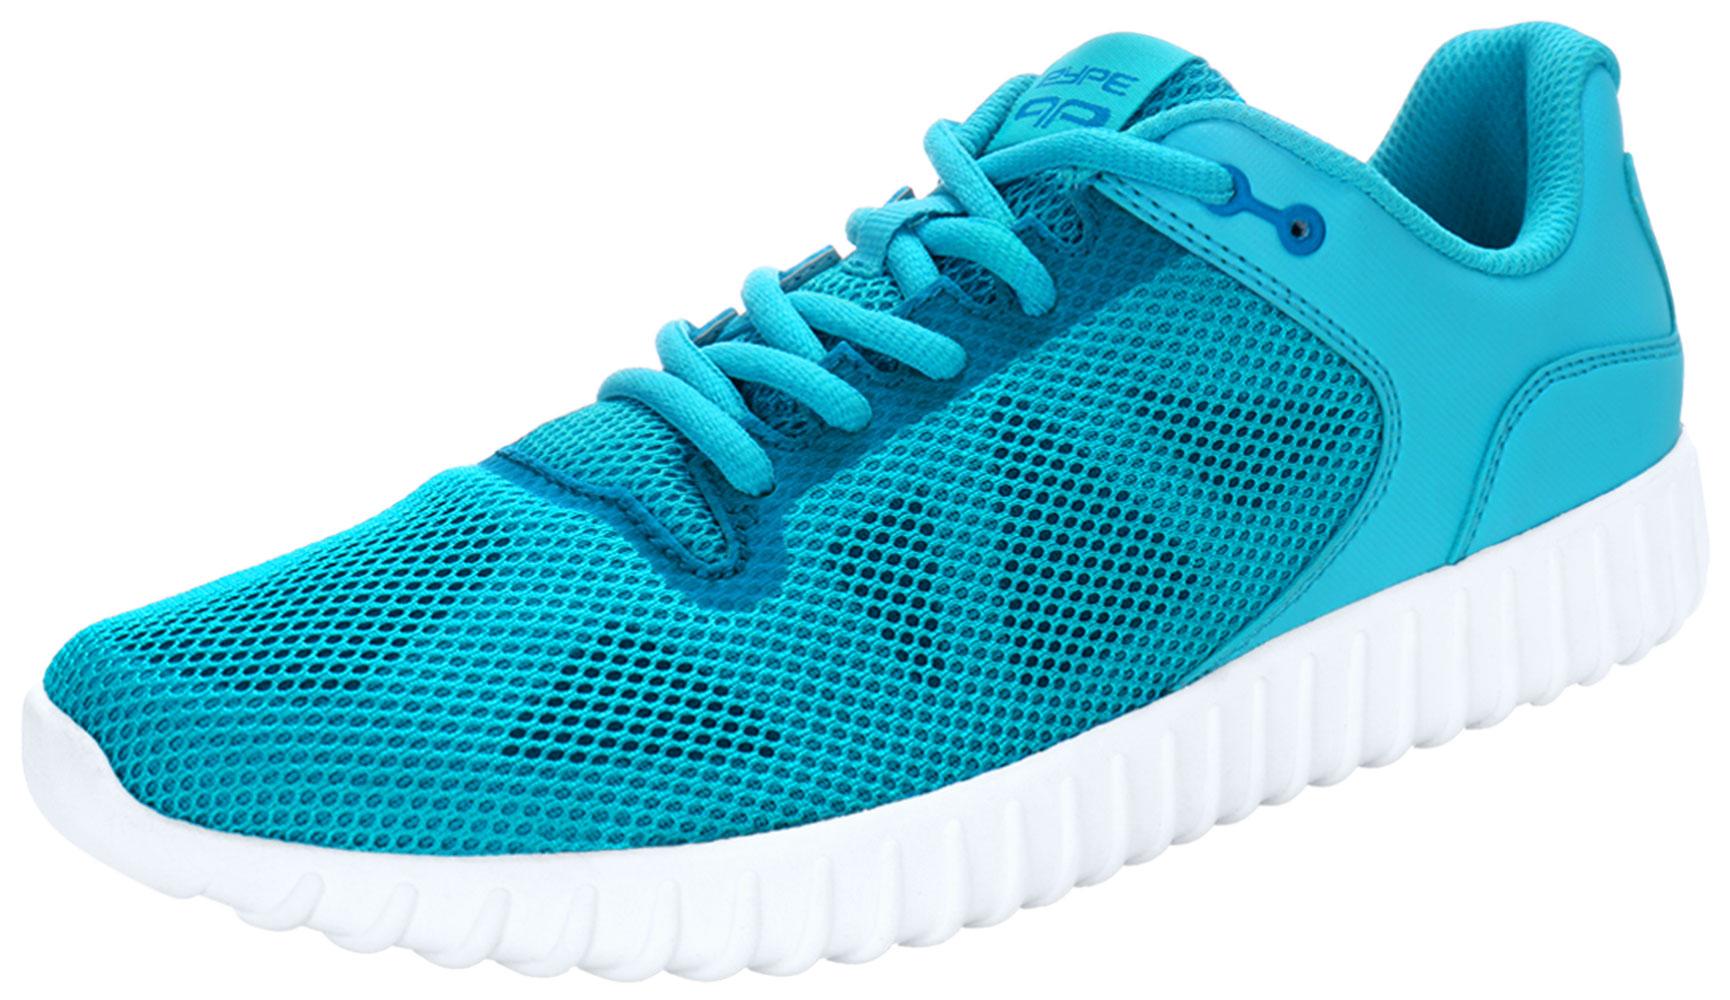 PYPE Women Geometric Prints Lace Up Mesh Training Shoes Blue US 8.5